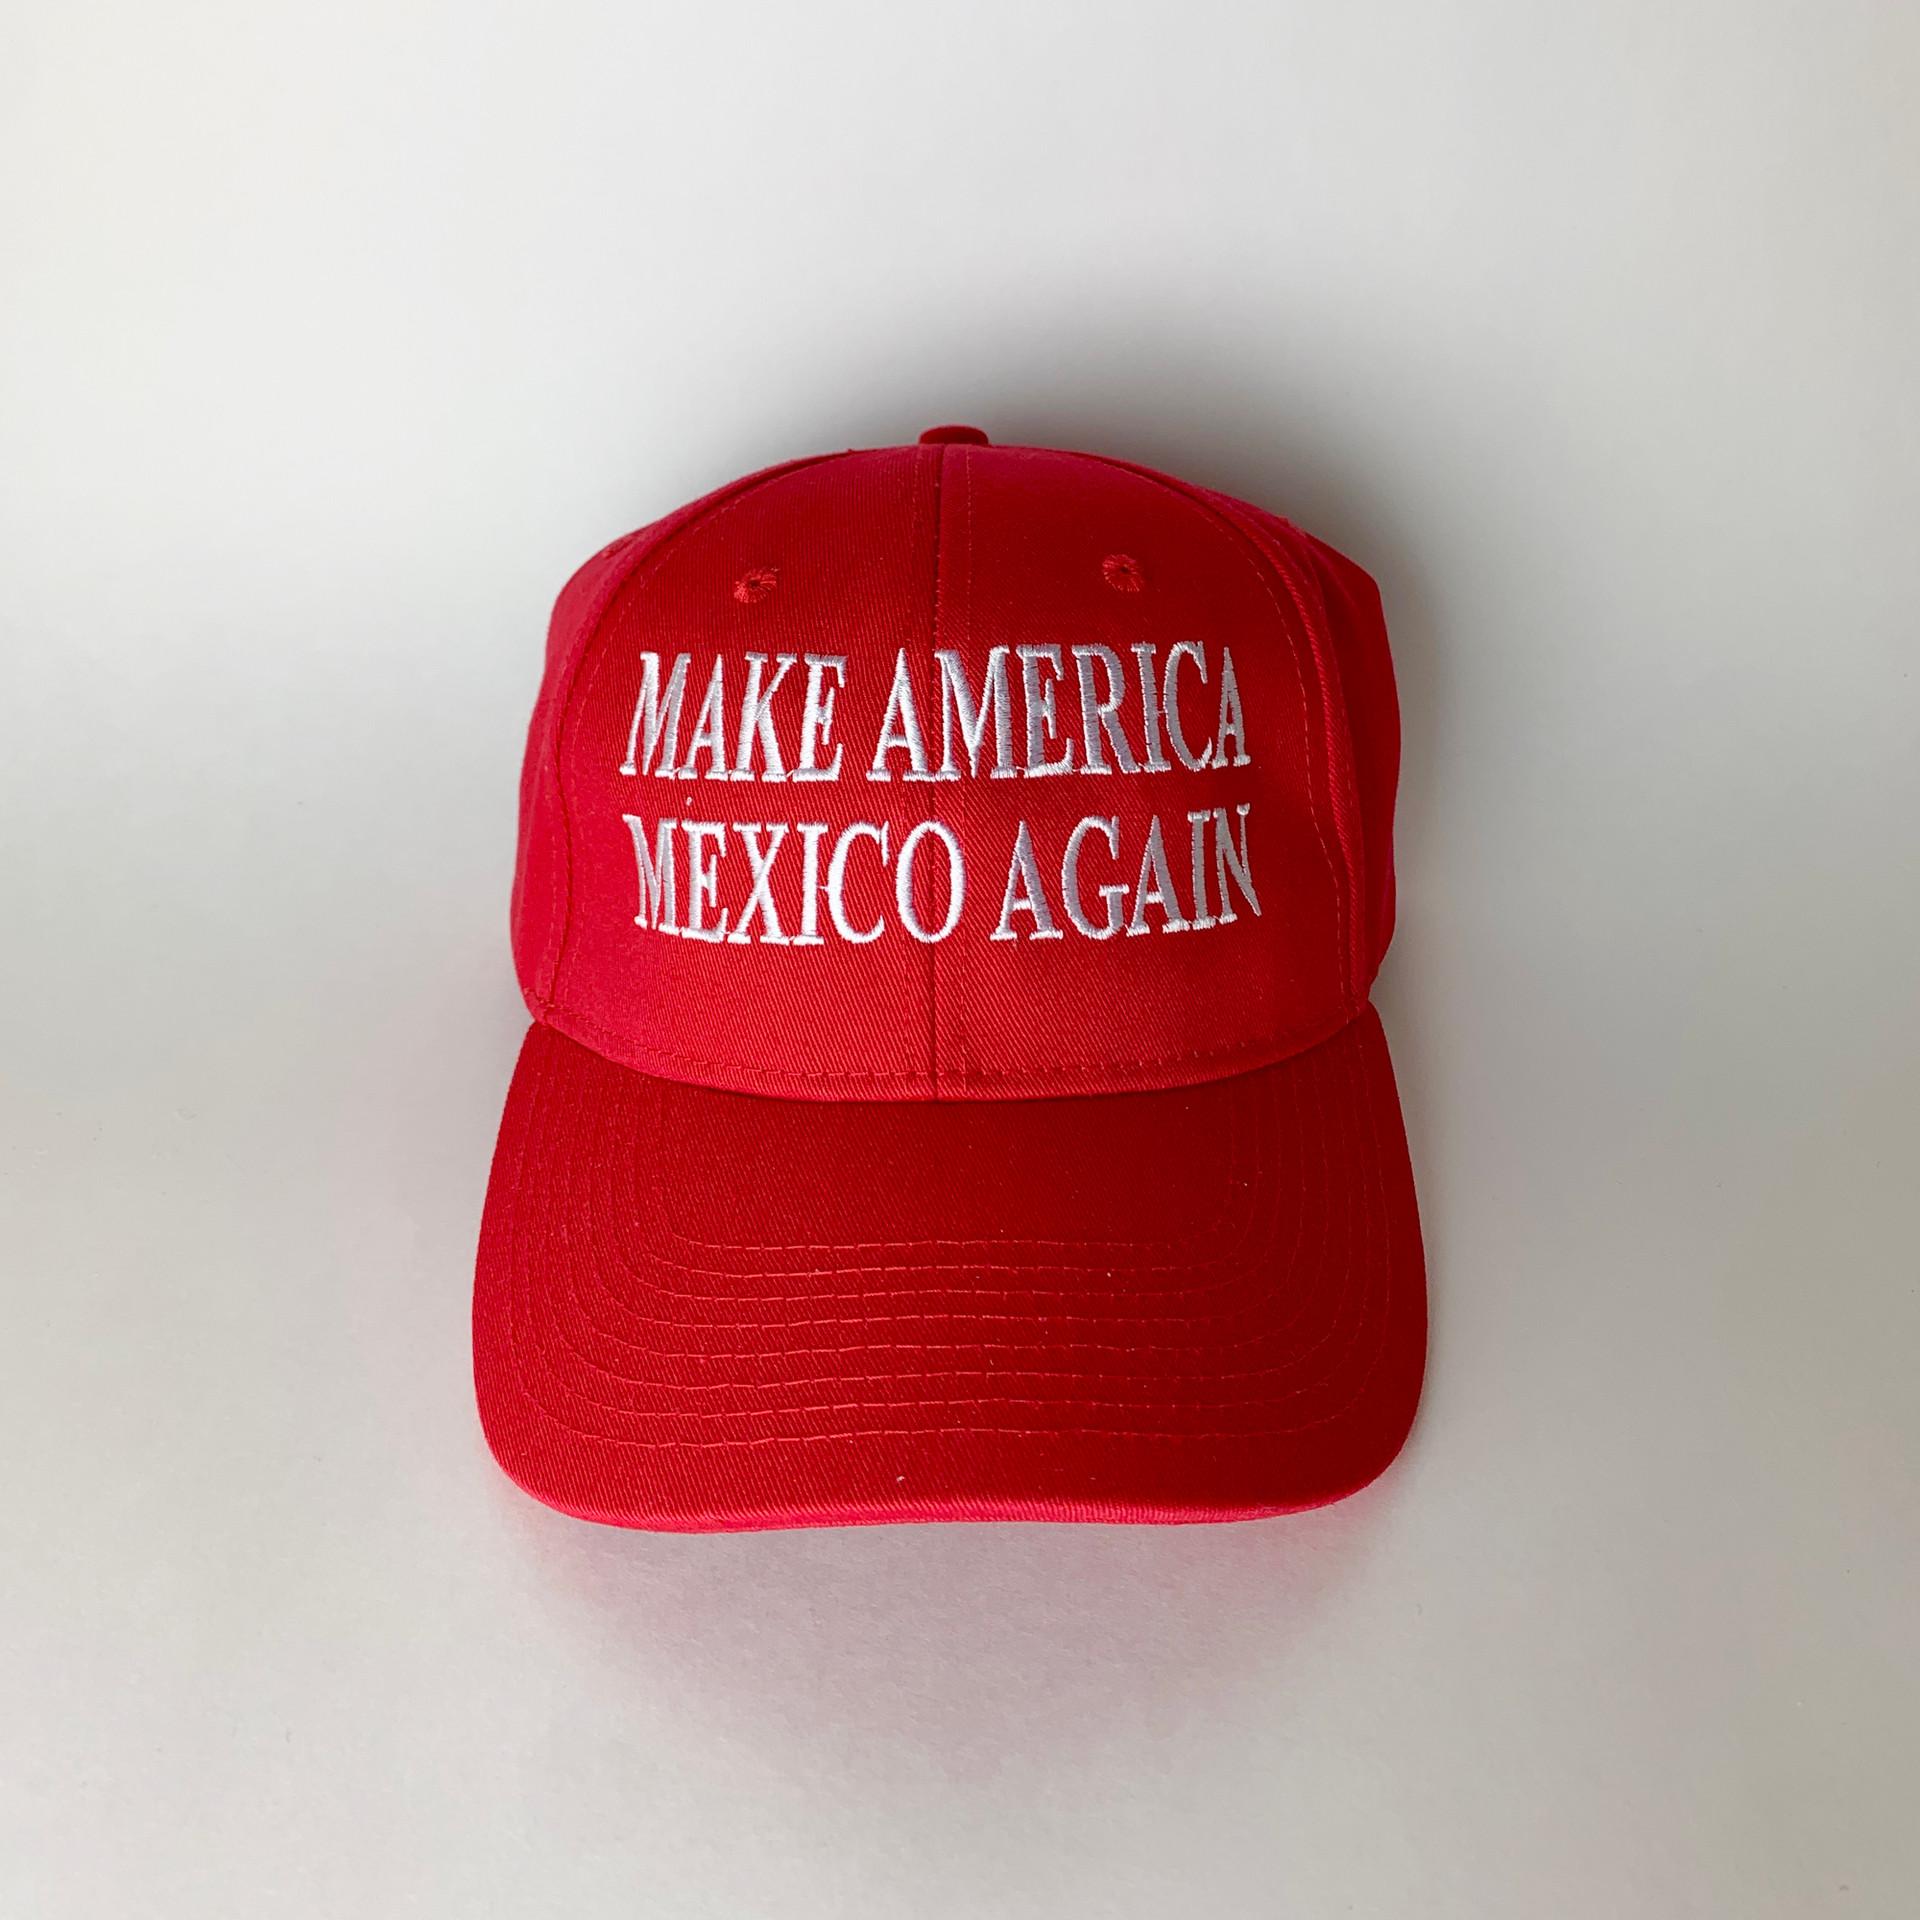 Make America Mexico Again